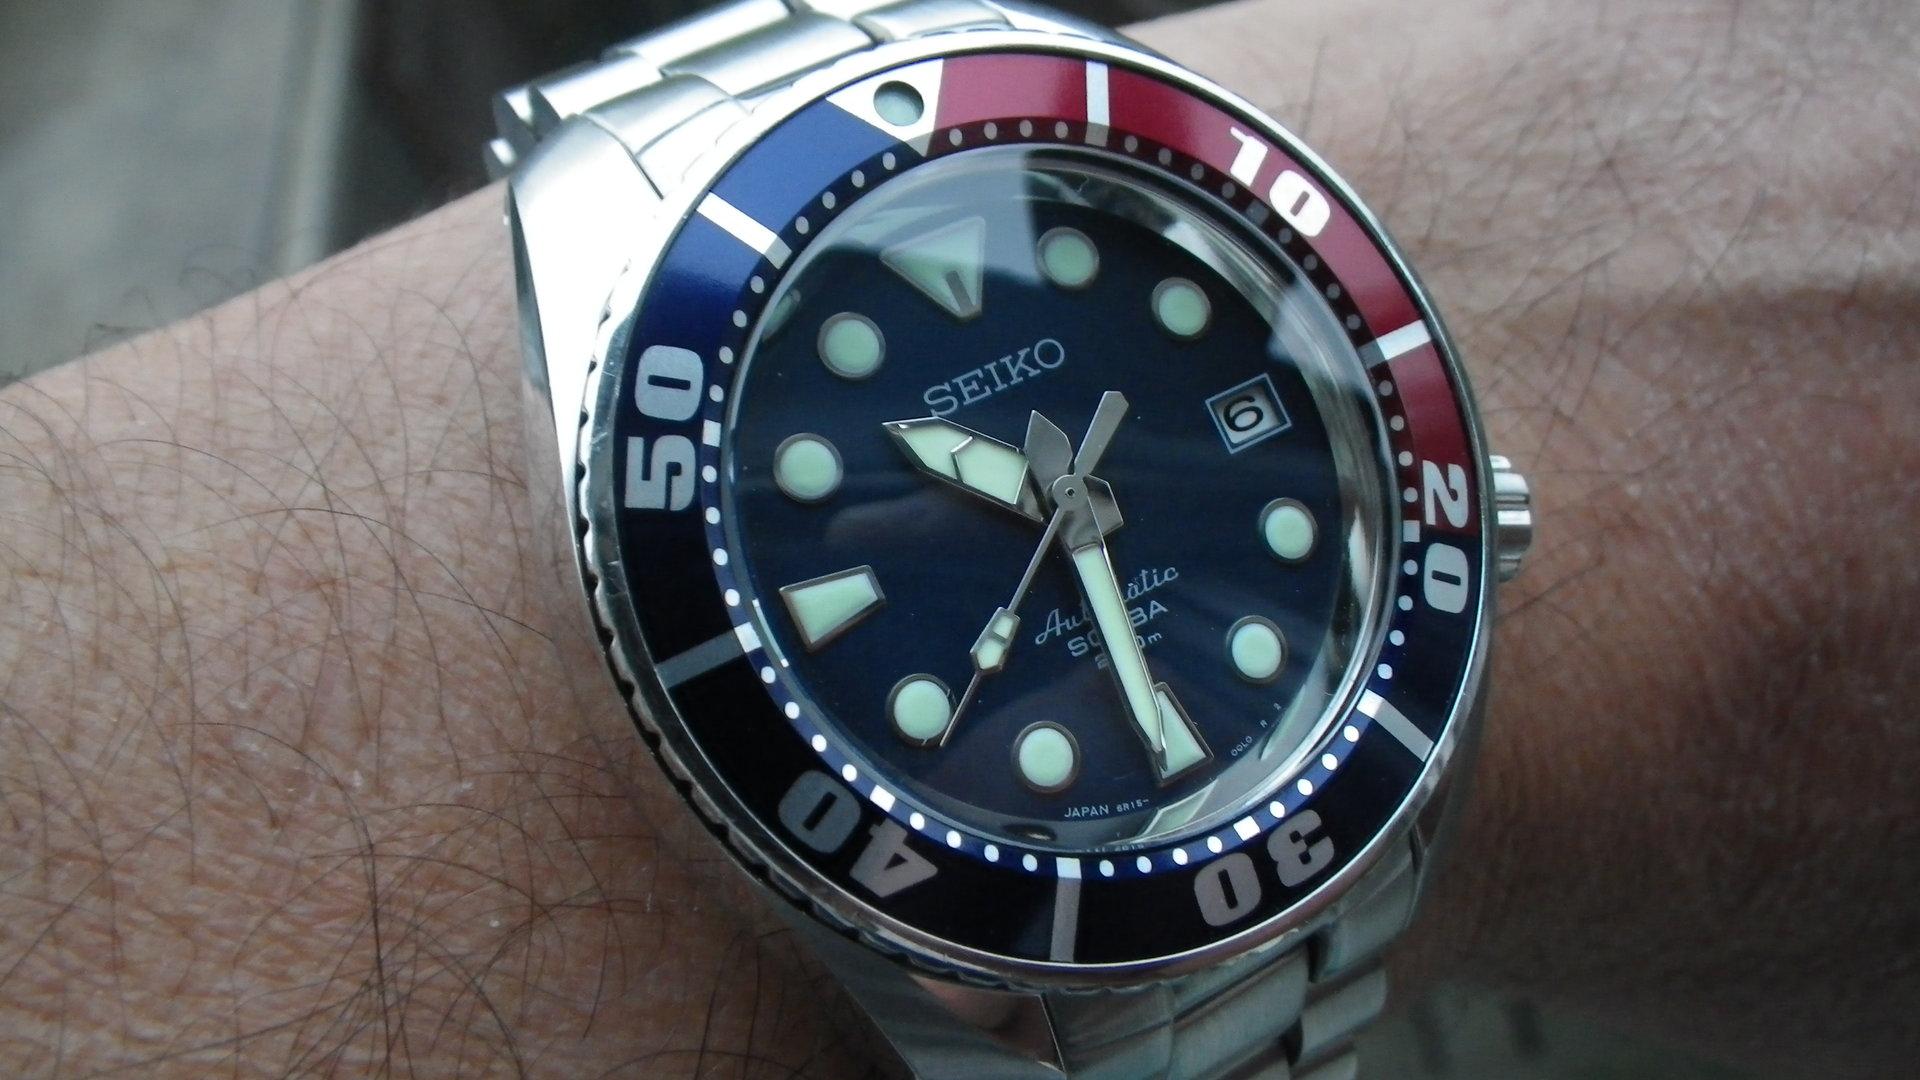 Seiko SUMO  ...027, suma y sigue 982045d1417860159t-seiko-pepsi-sumo-saphirglas-supermod-sbdc003-imgp7781